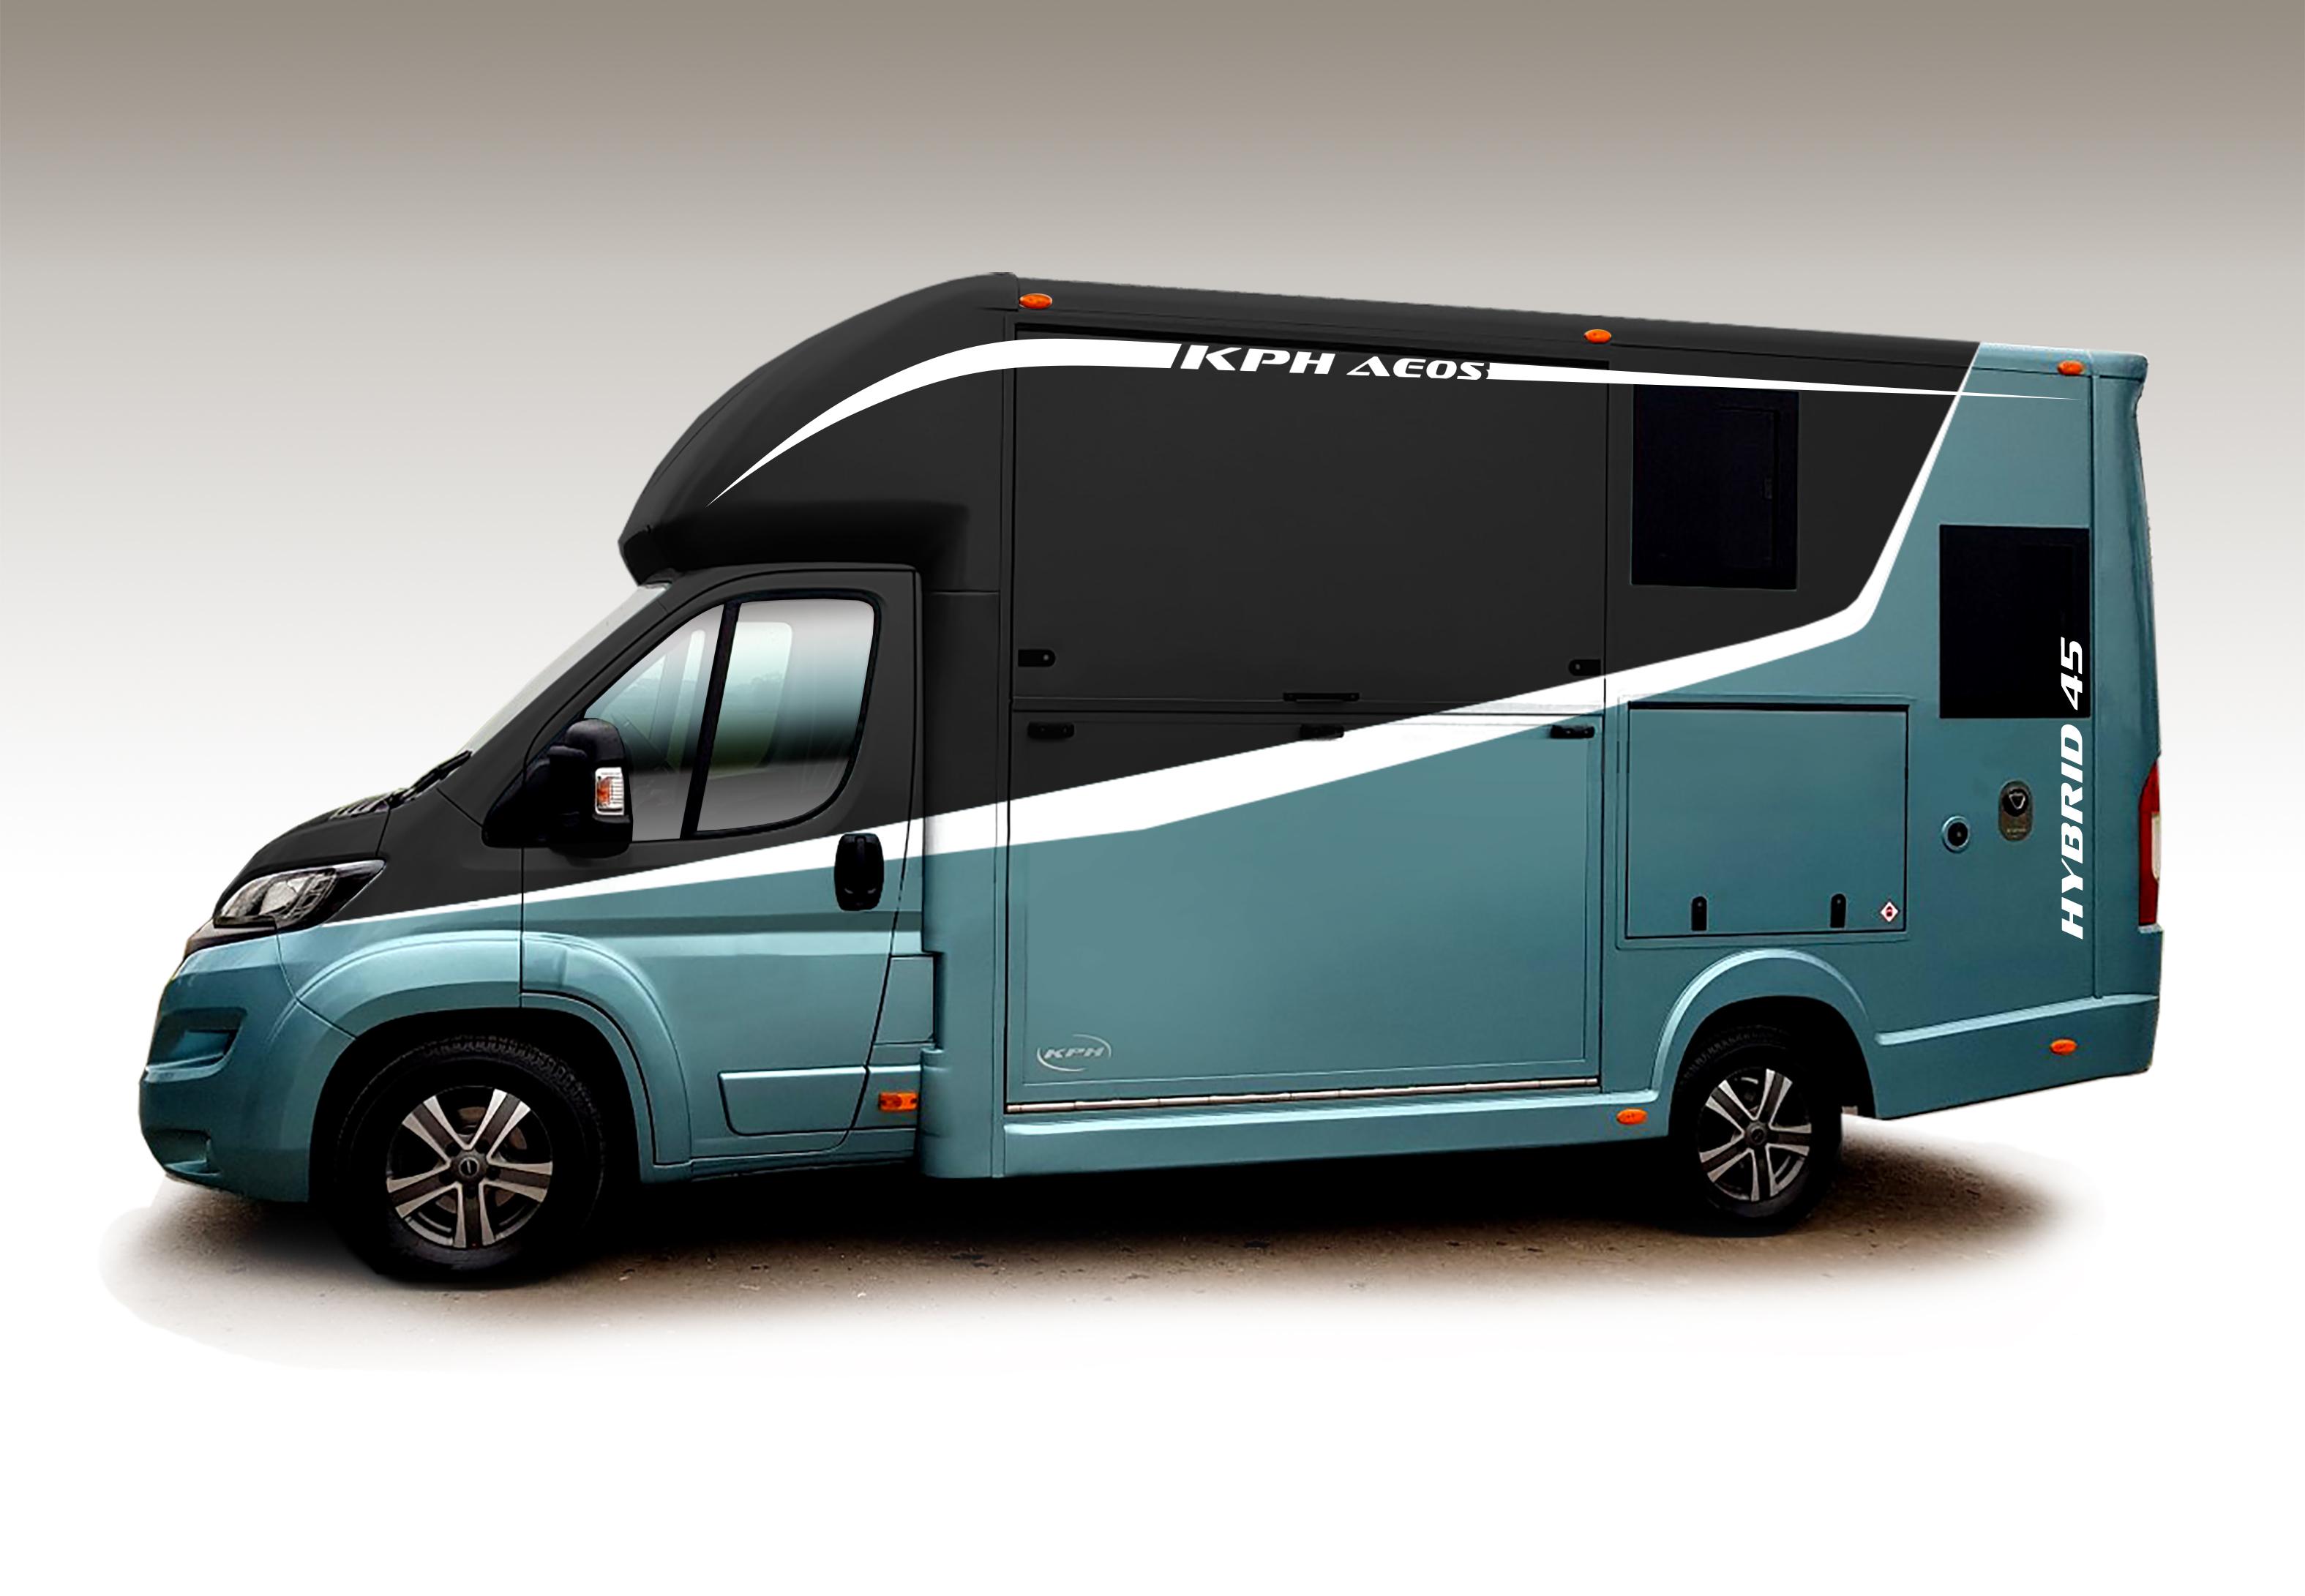 KPH Aeos Hybrid 4.5 in Blue